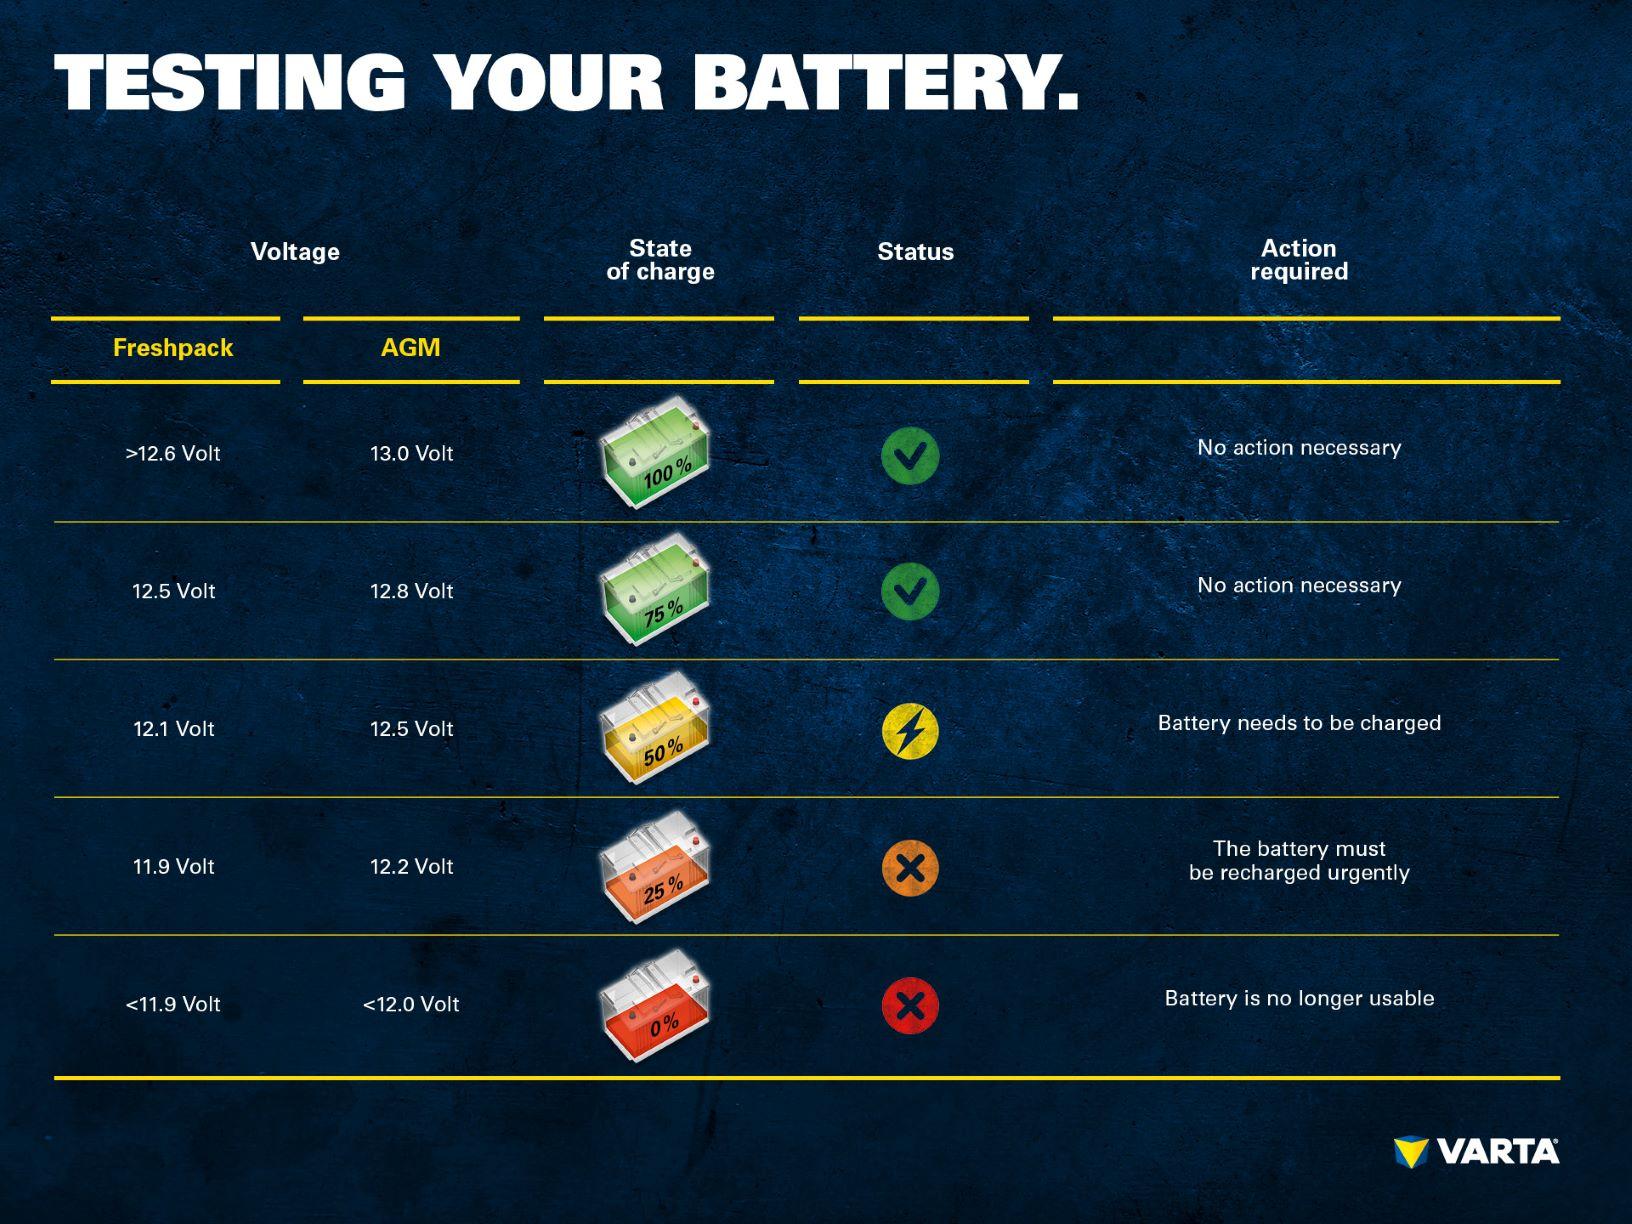 Testing battery